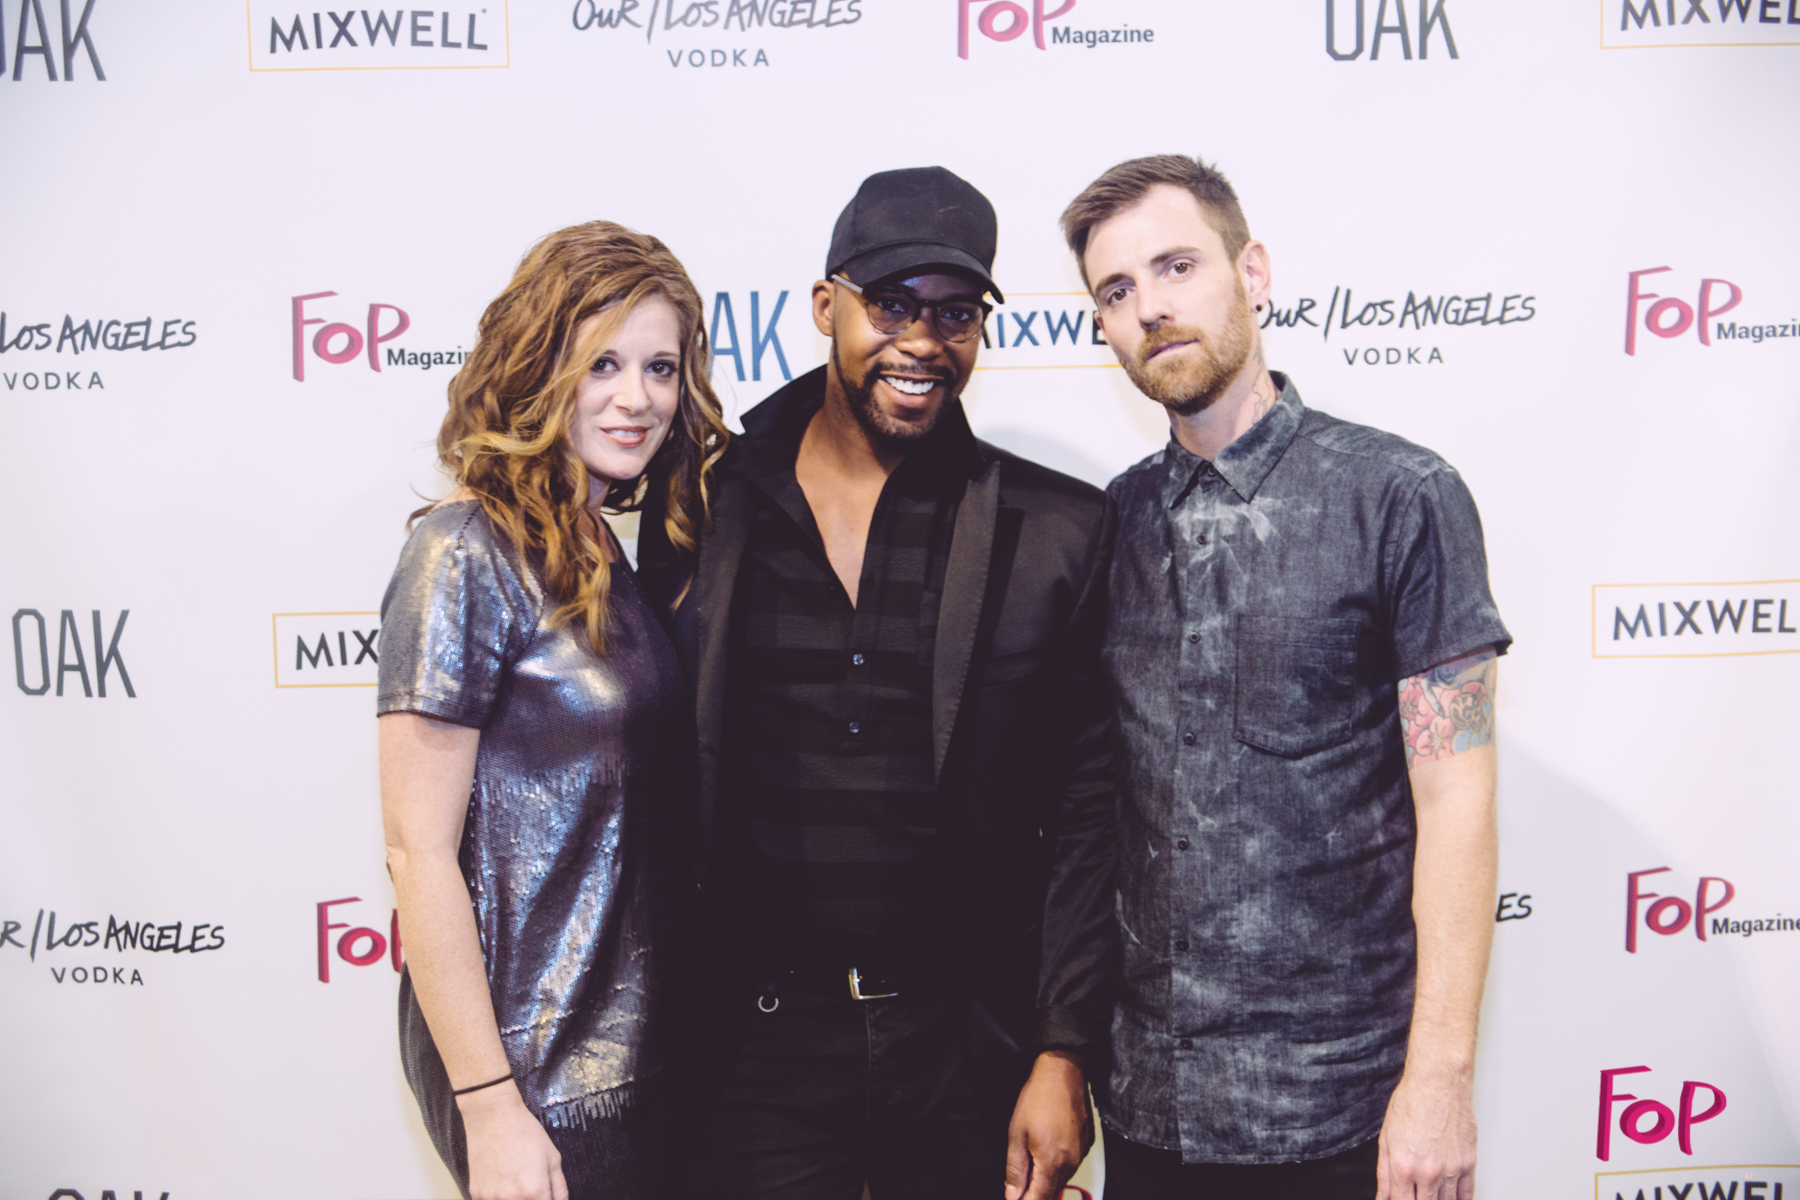 Brooke Barnett, Quentin Fears & Zack Hemenway